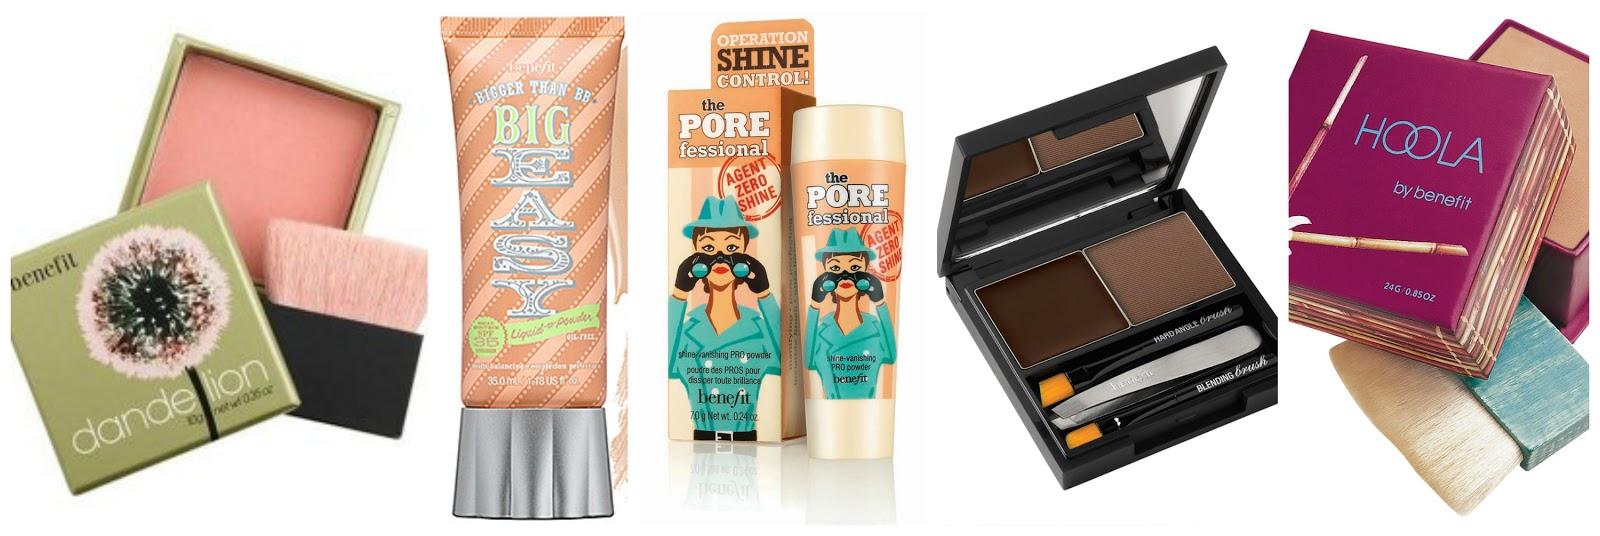 Benefit Cosmetics best sellers